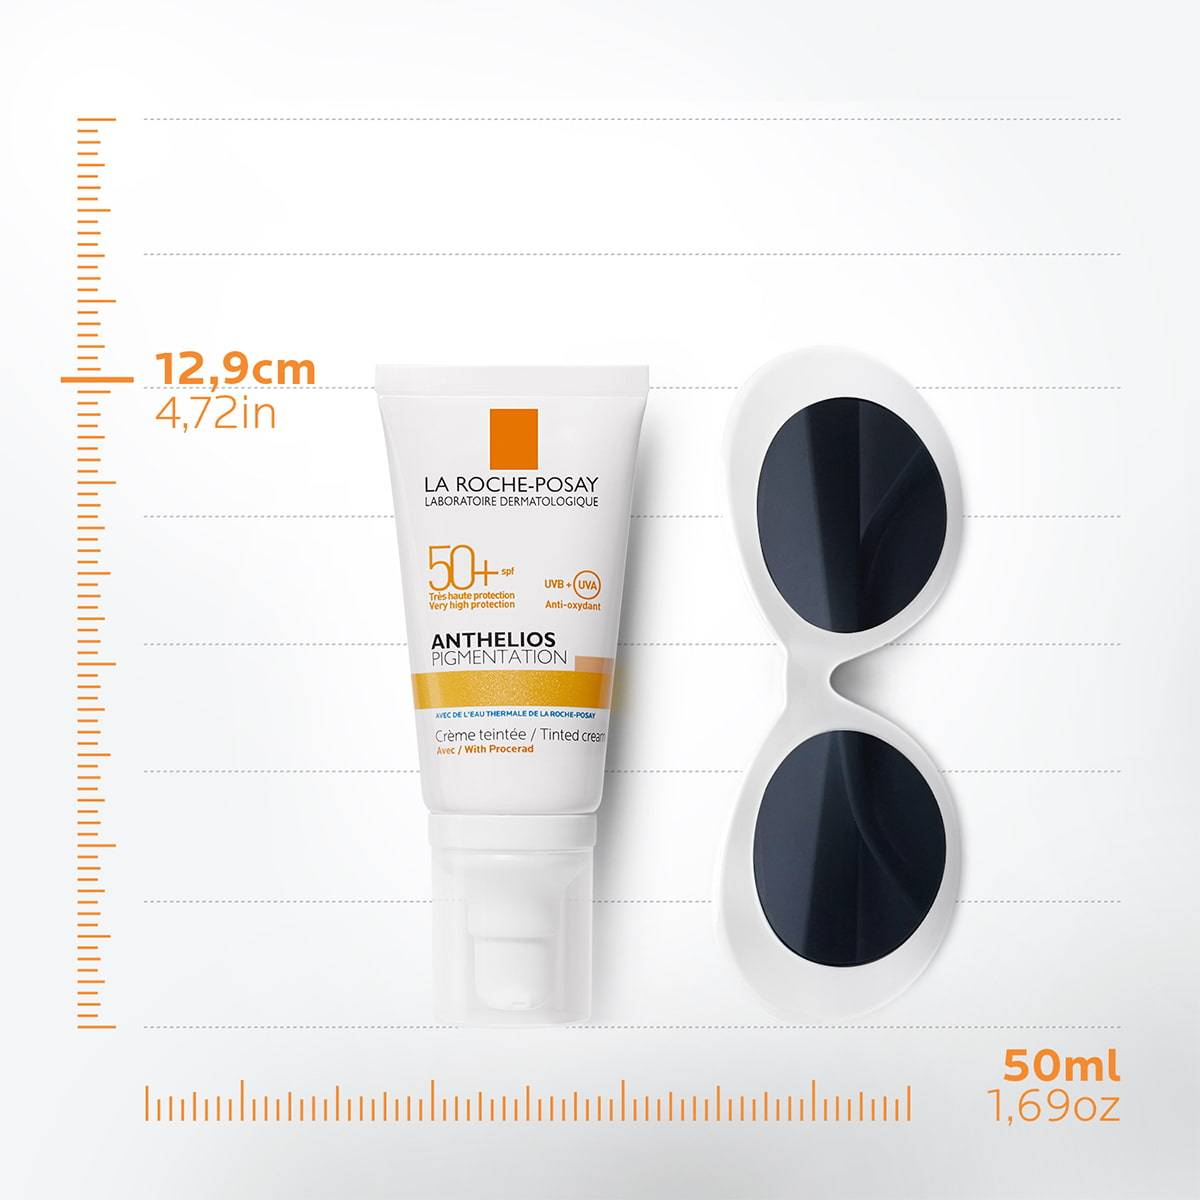 La Roche Posay Produktsida Sol Anthelios Pigmentation Tinted Cream